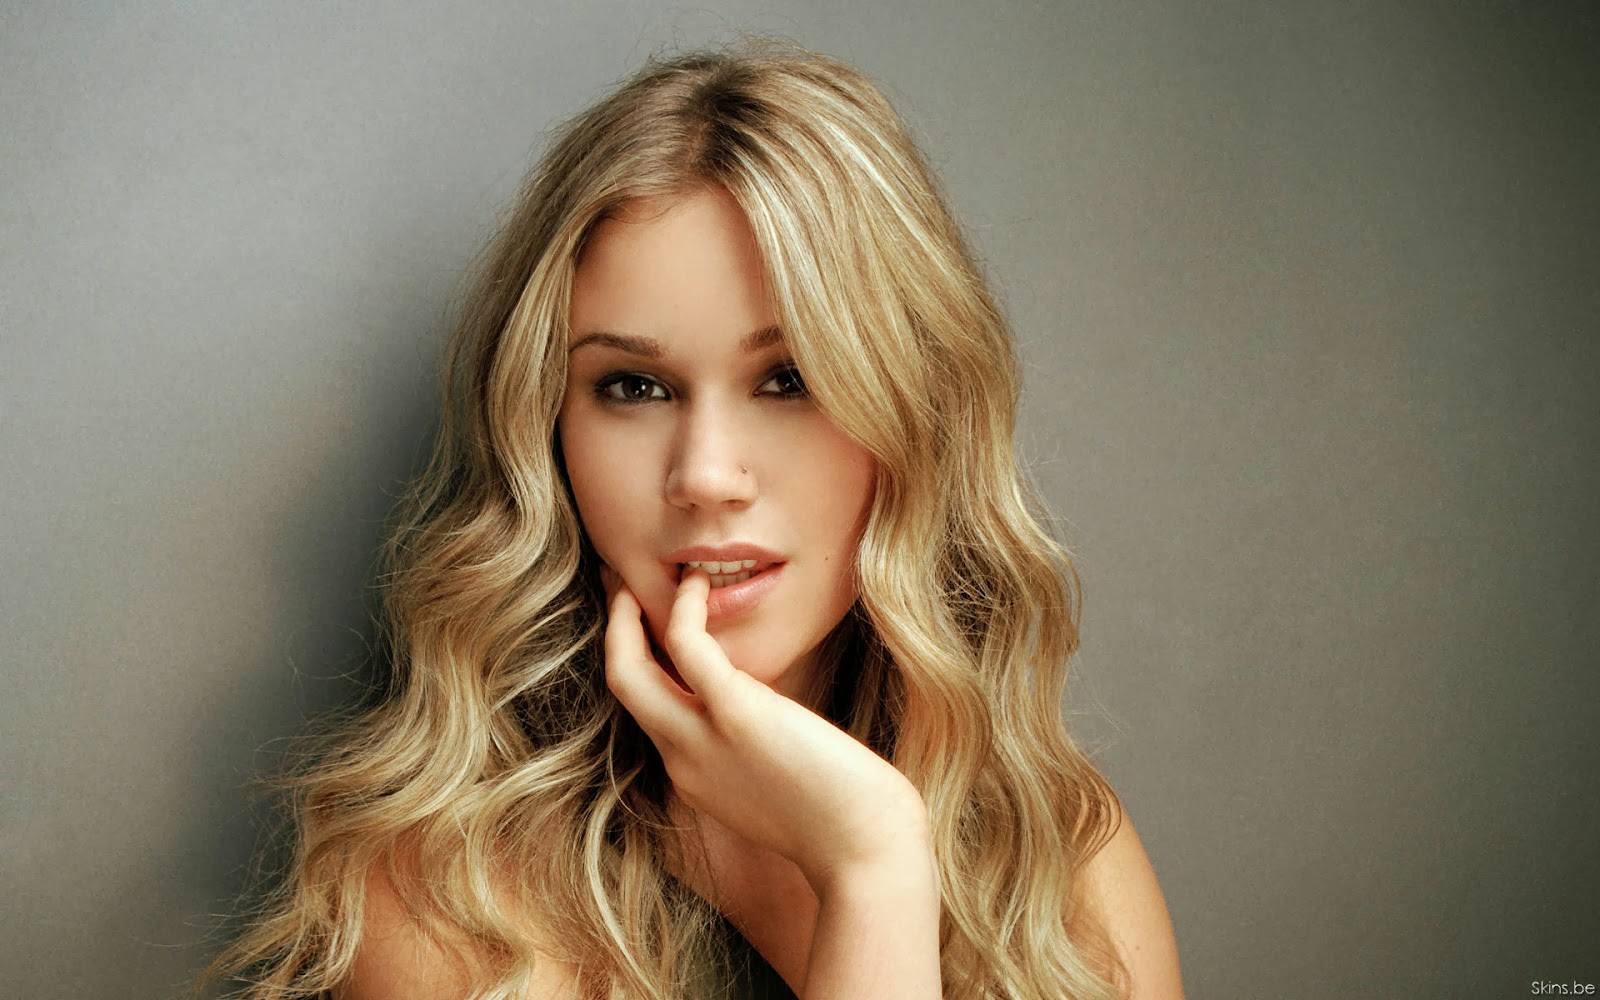 Rachel Bilson 2013 Hair joss stone - Celeb Ima...